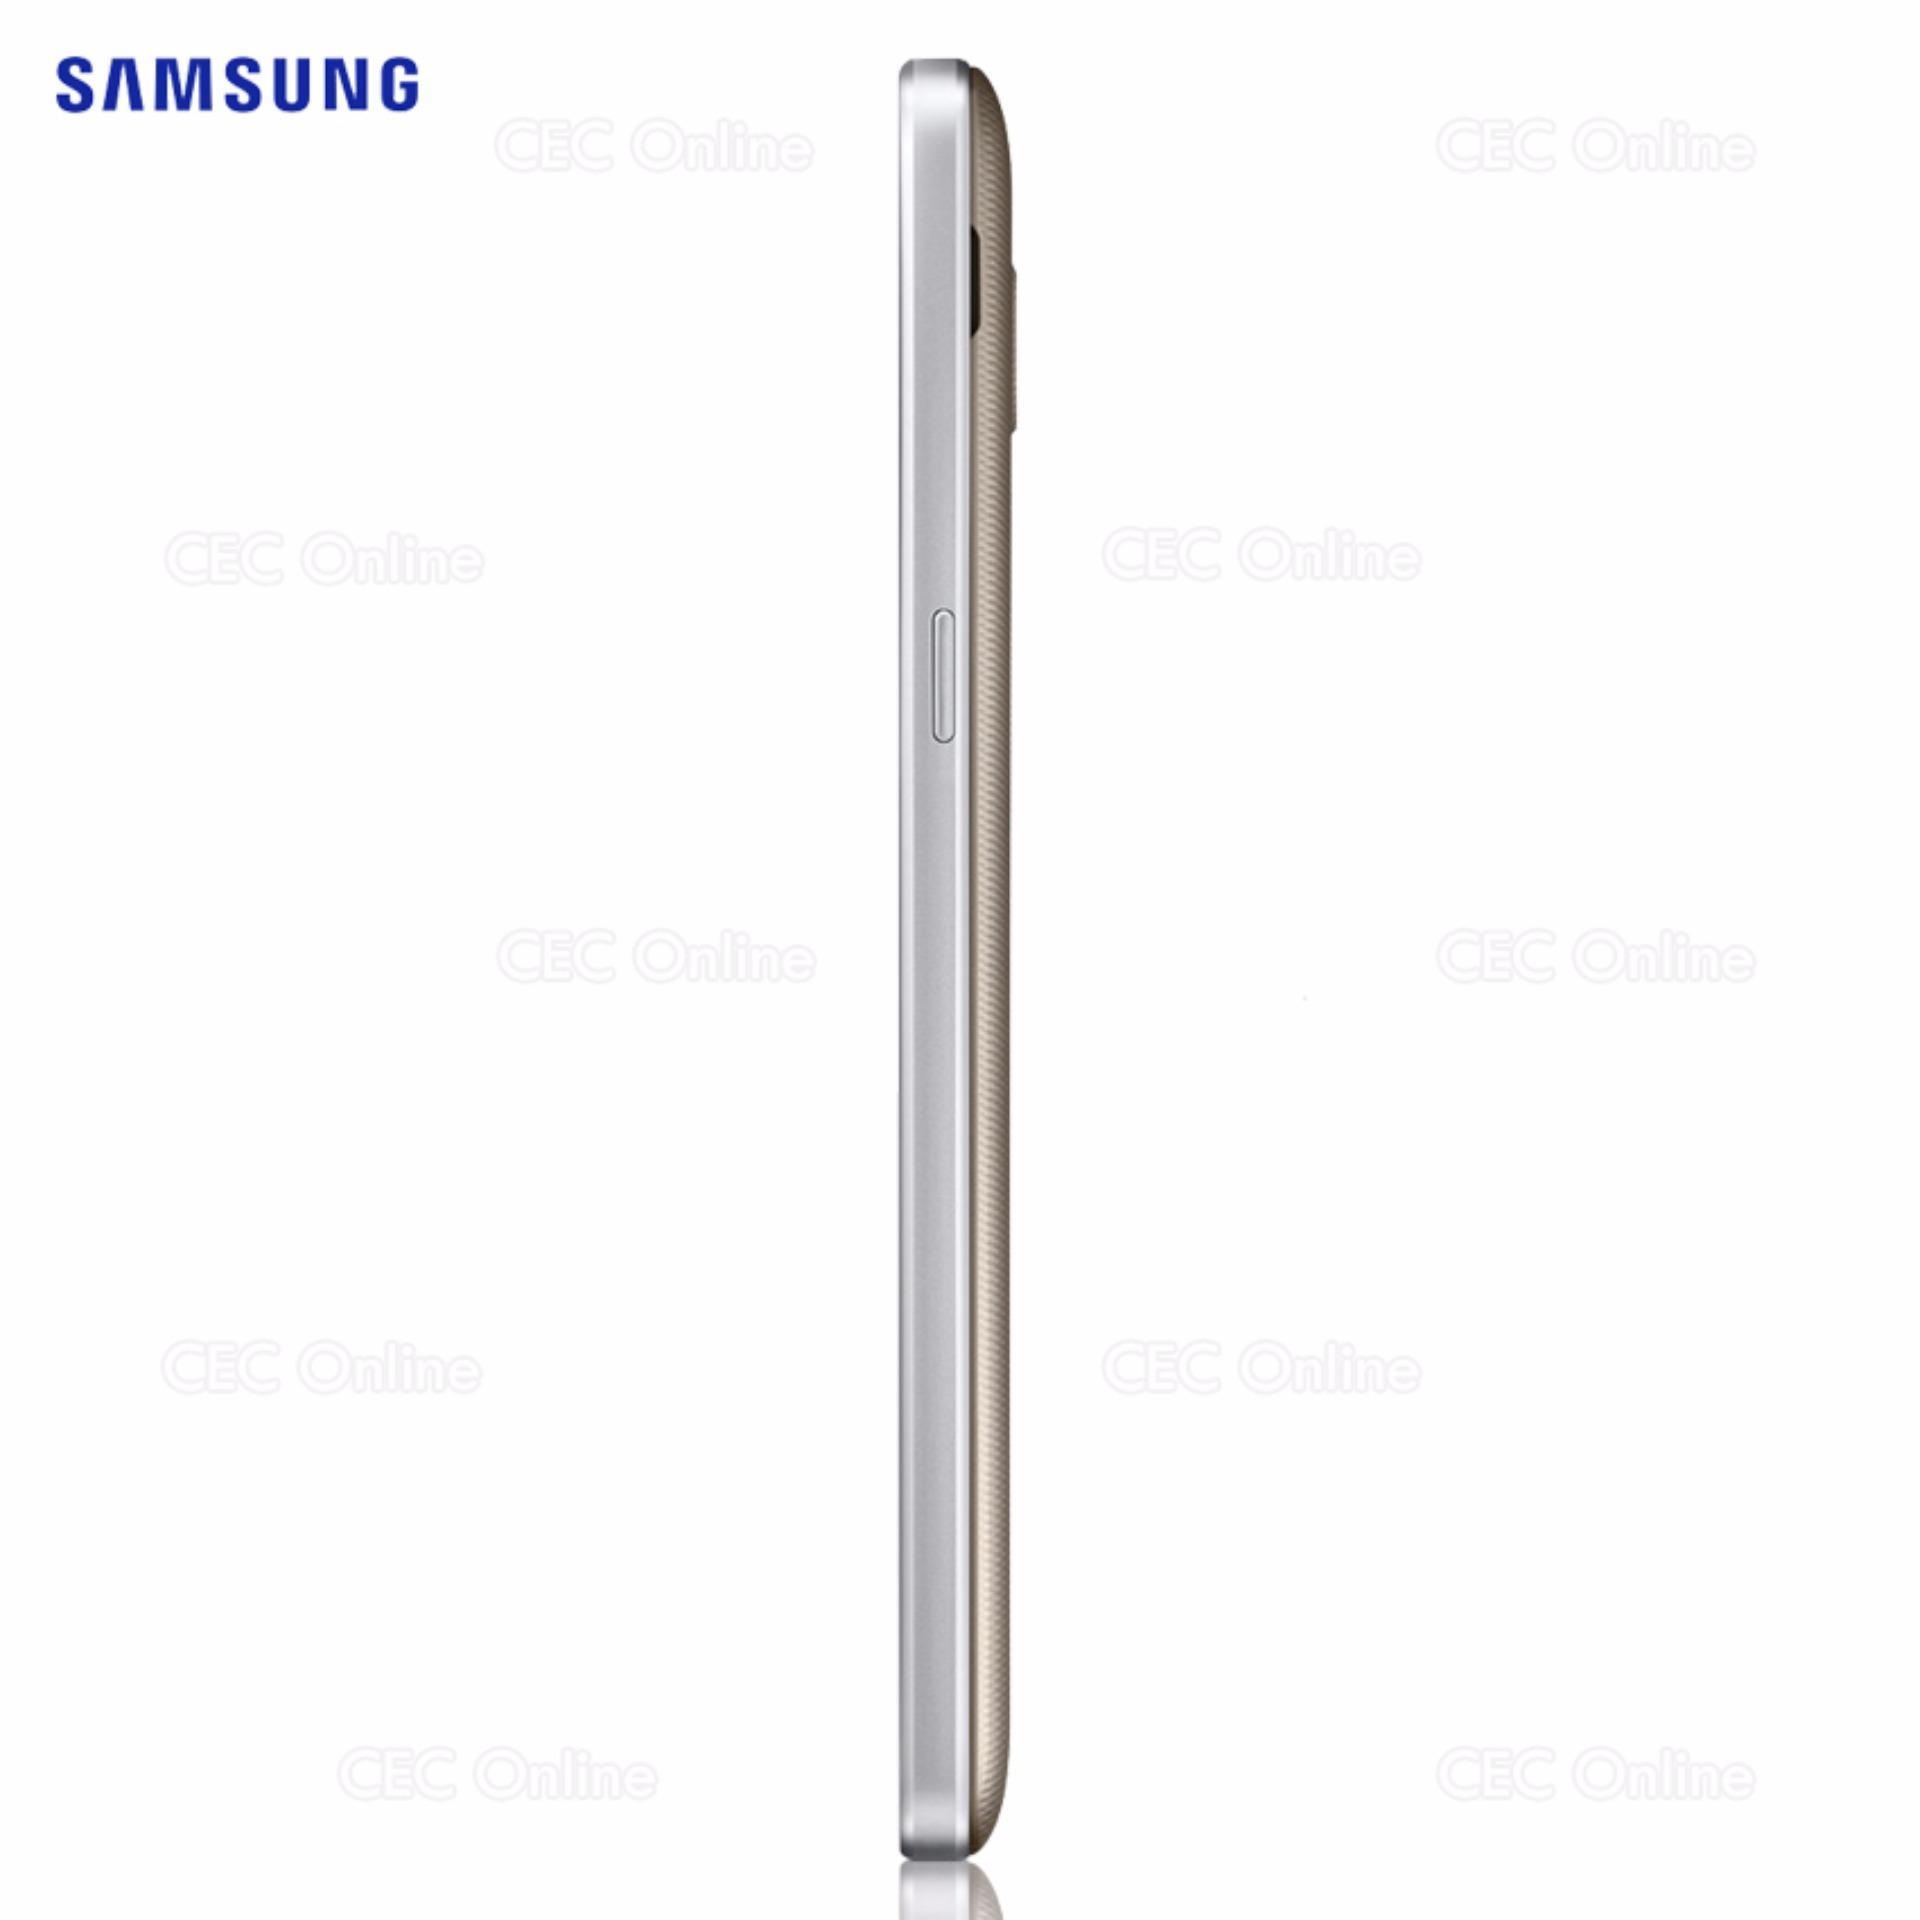 ... Samsung Galaxy J2 Prime LTE 8GB SM-G532G (Gold) ...